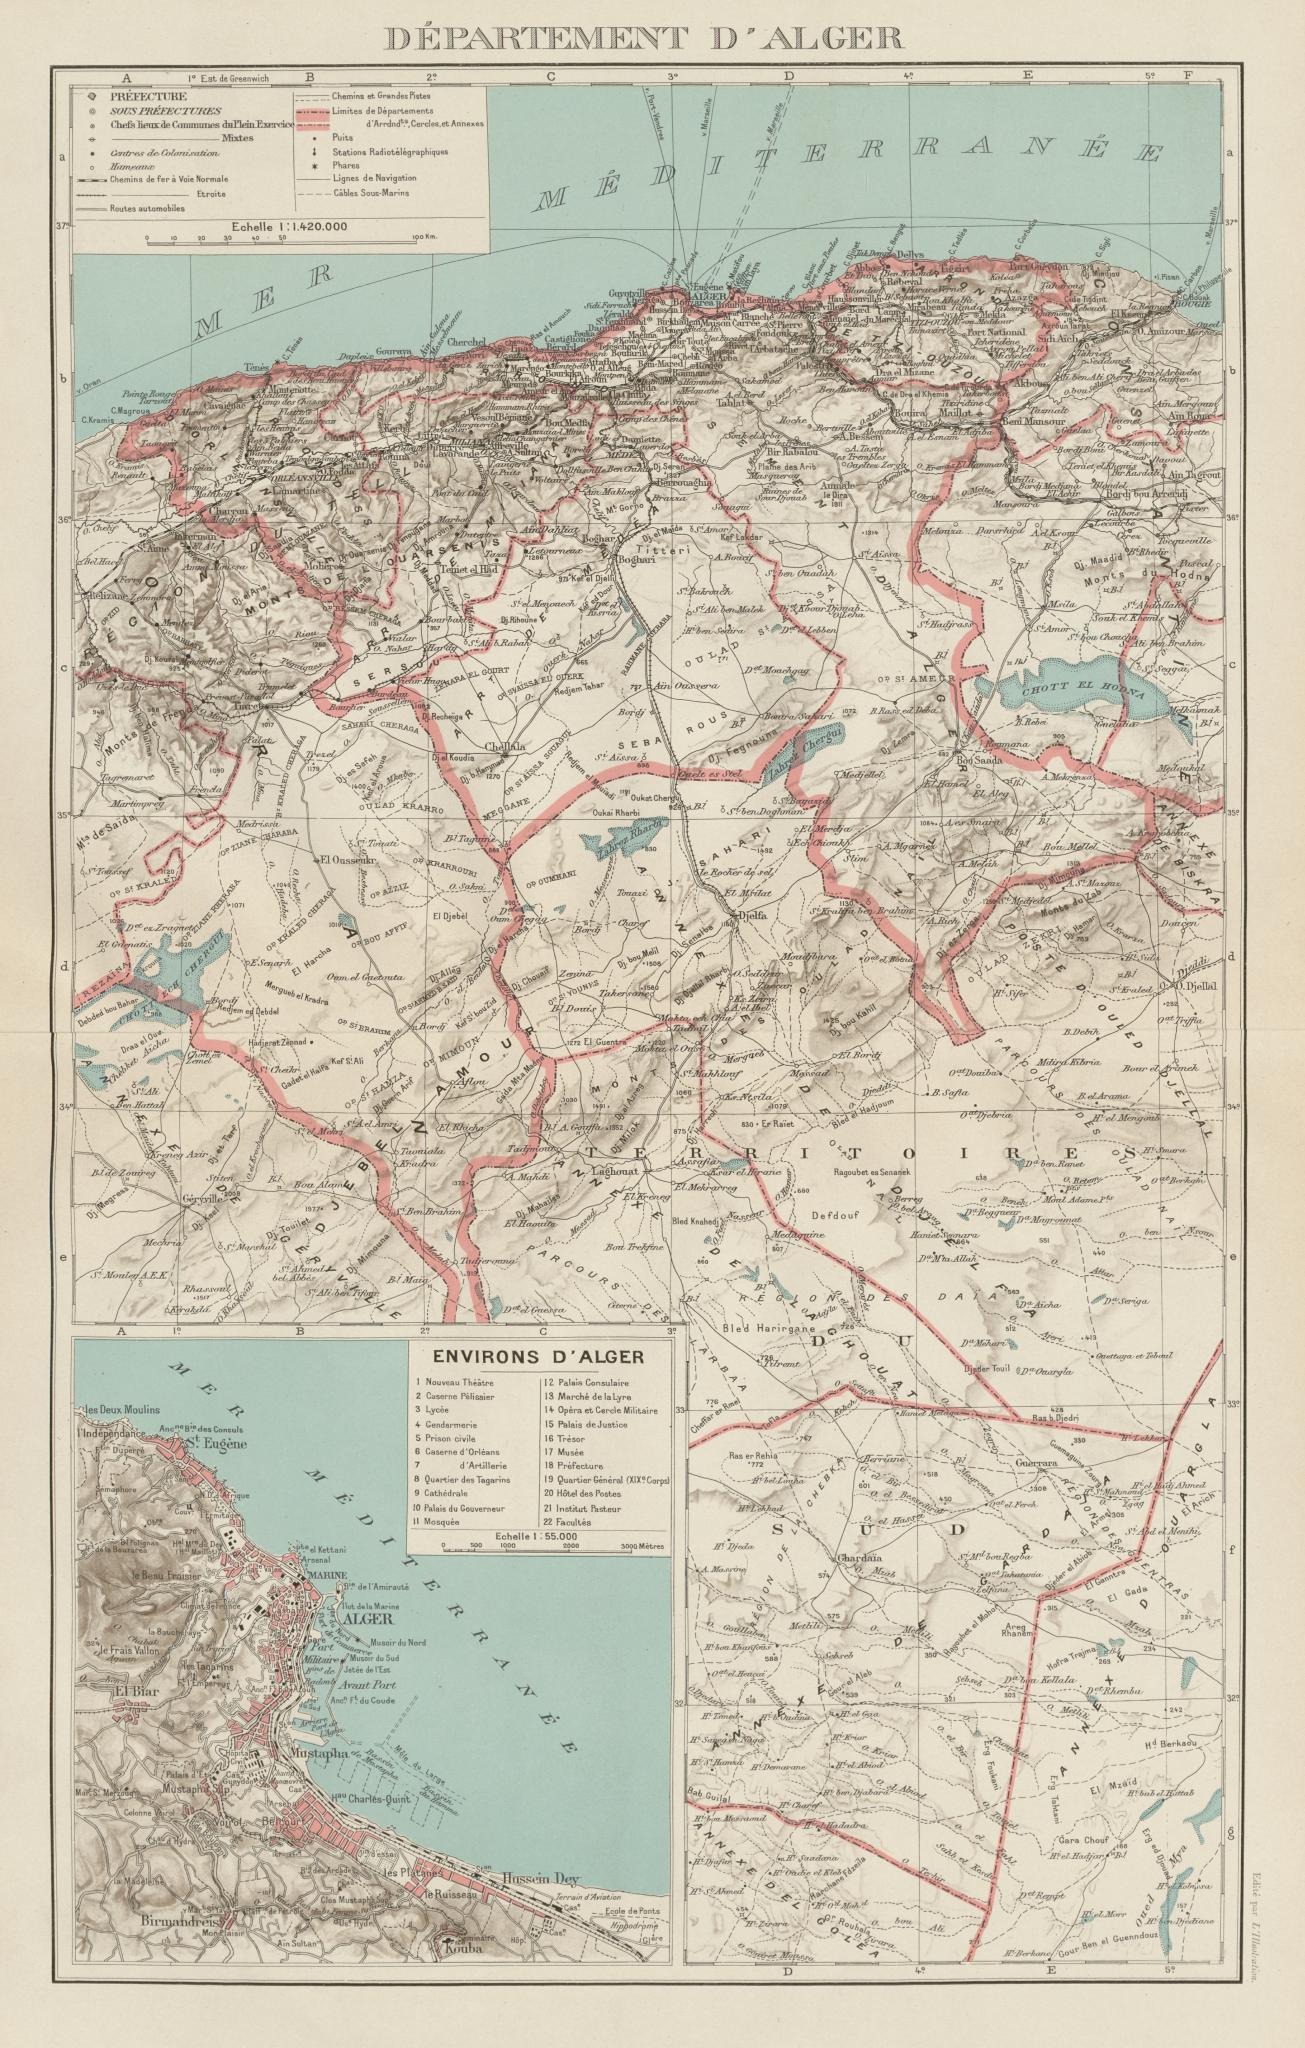 Associate Product FRENCH ALGERIA. Departement d'Alger. Algiers environs & city plan 1929 old map